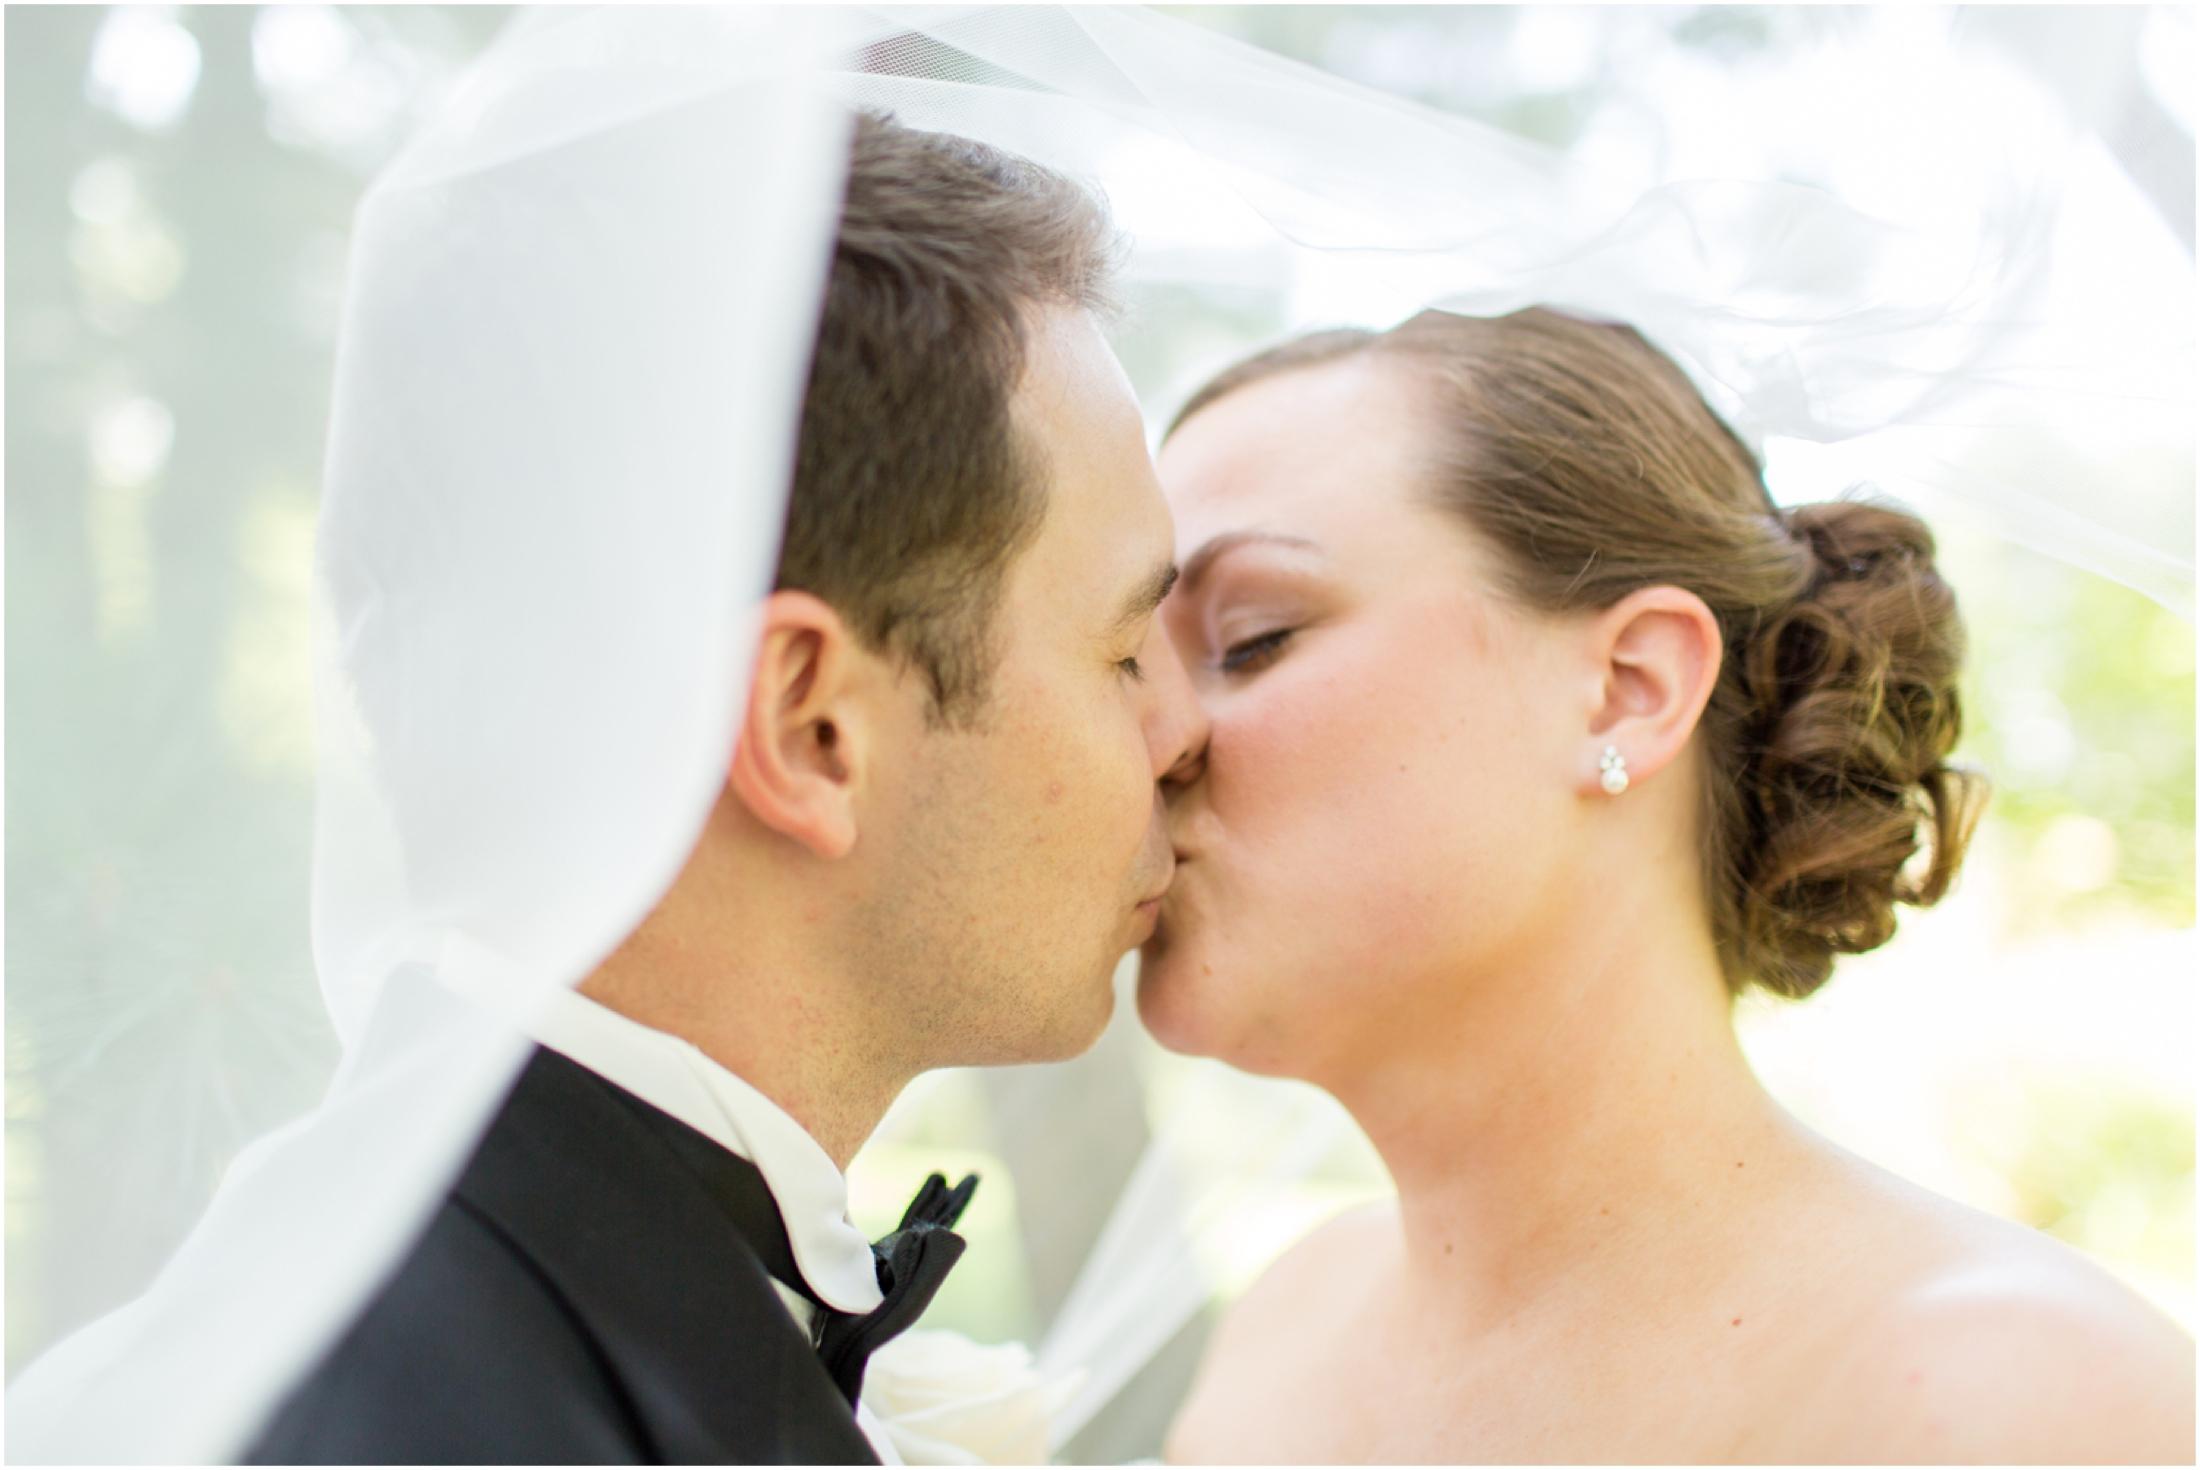 3-Bride-Groom-Portraits-Windsor-Wedding-468.jpg